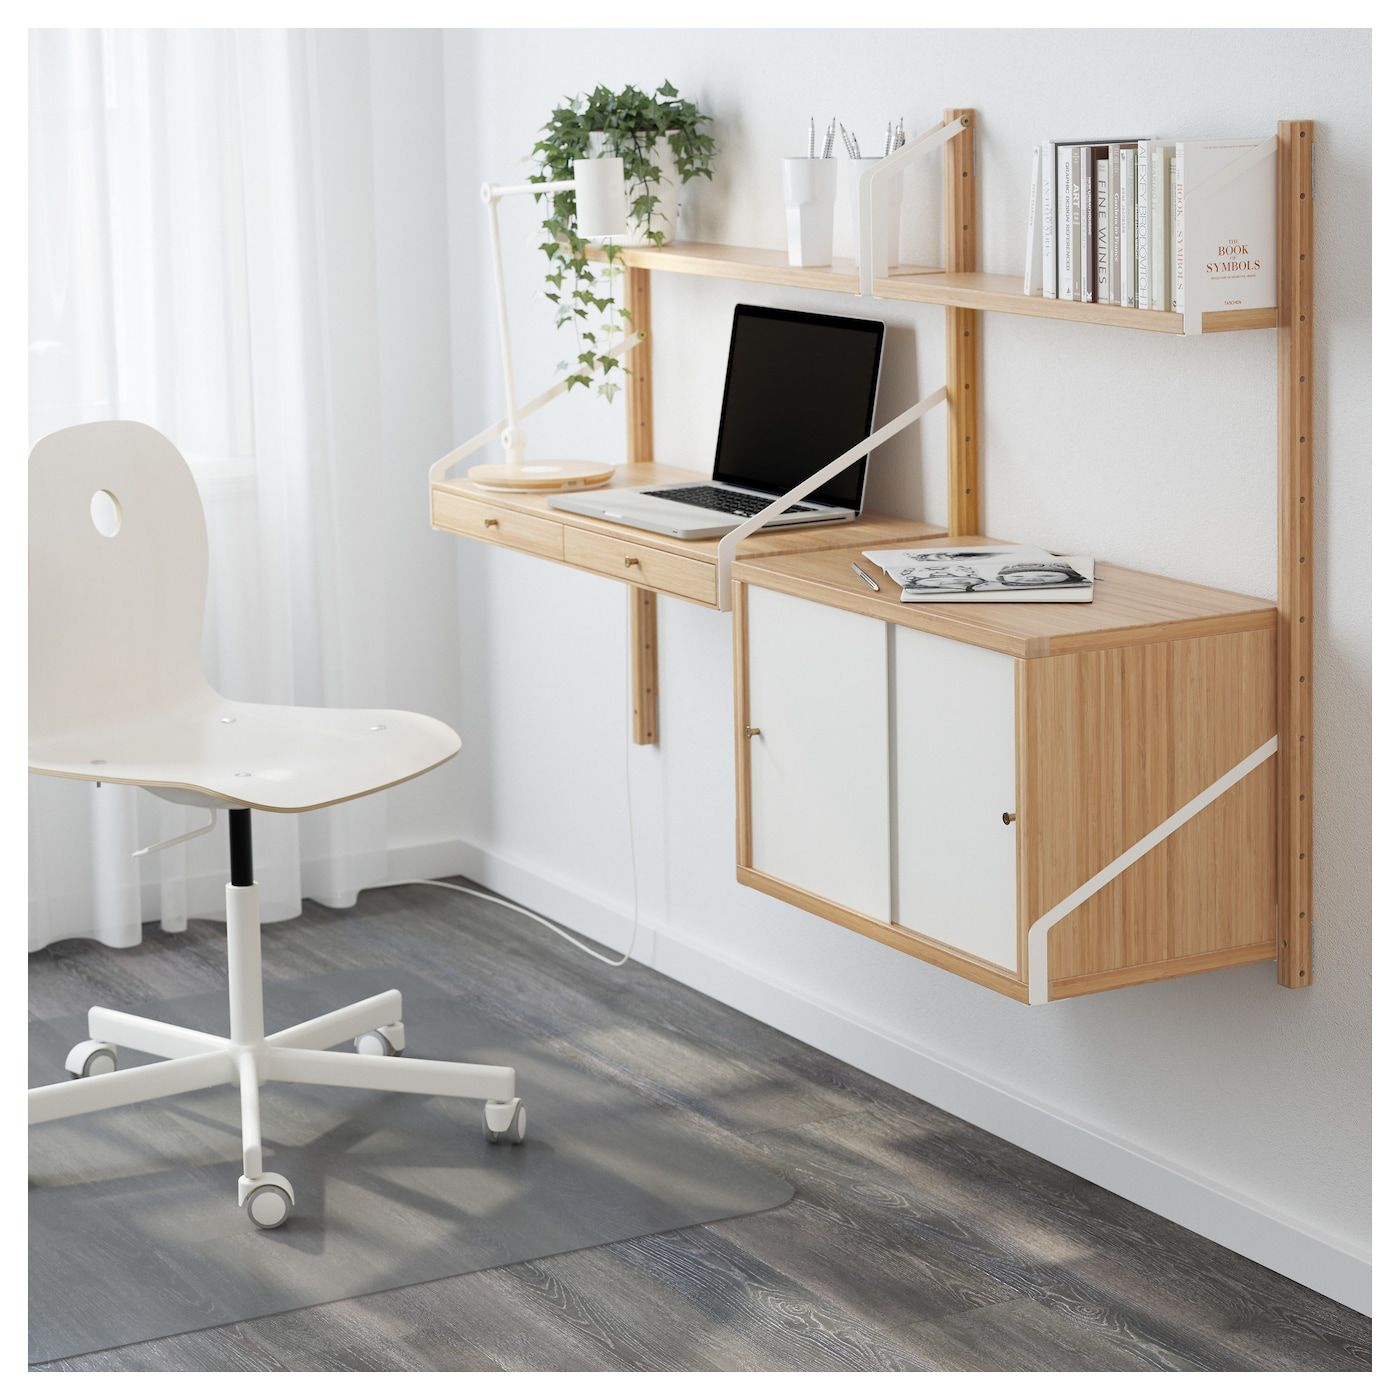 Deco Etagere Murale Ikea